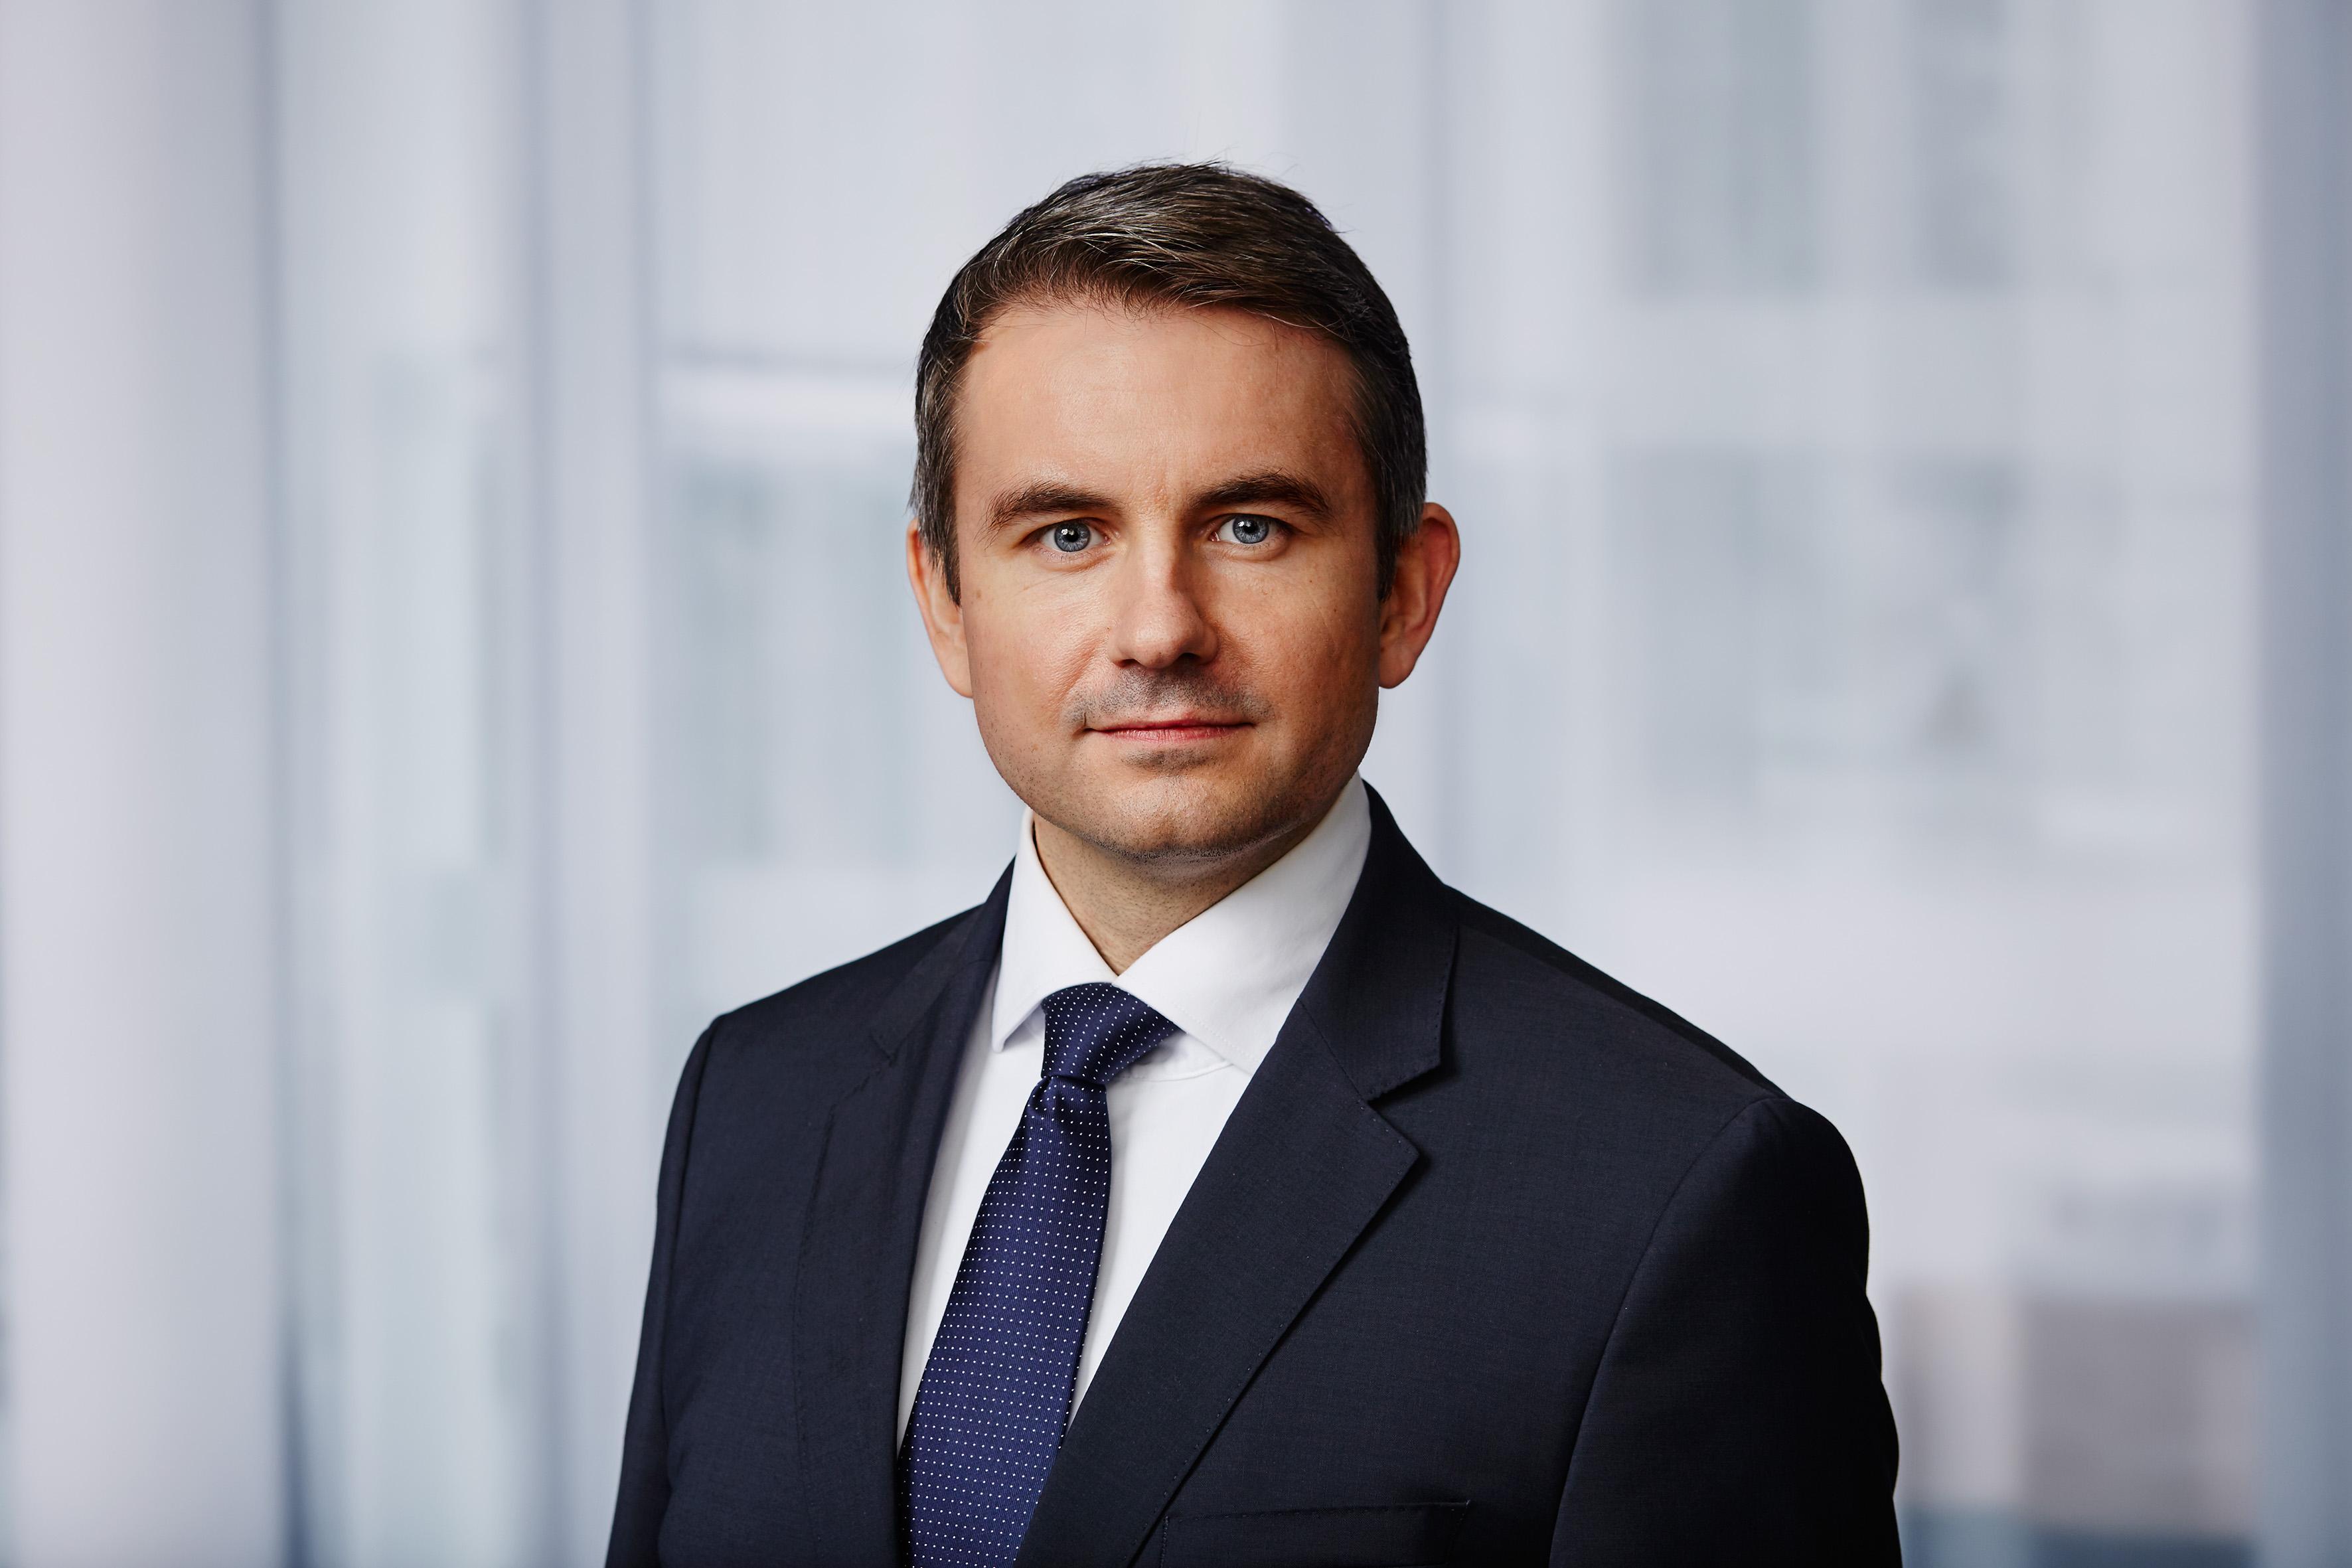 Chancen-Risiken-Was-bringt-das-Börsenjahr-2020-Kommentar-GodmodeTrader-Team-GodmodeTrader.de-1